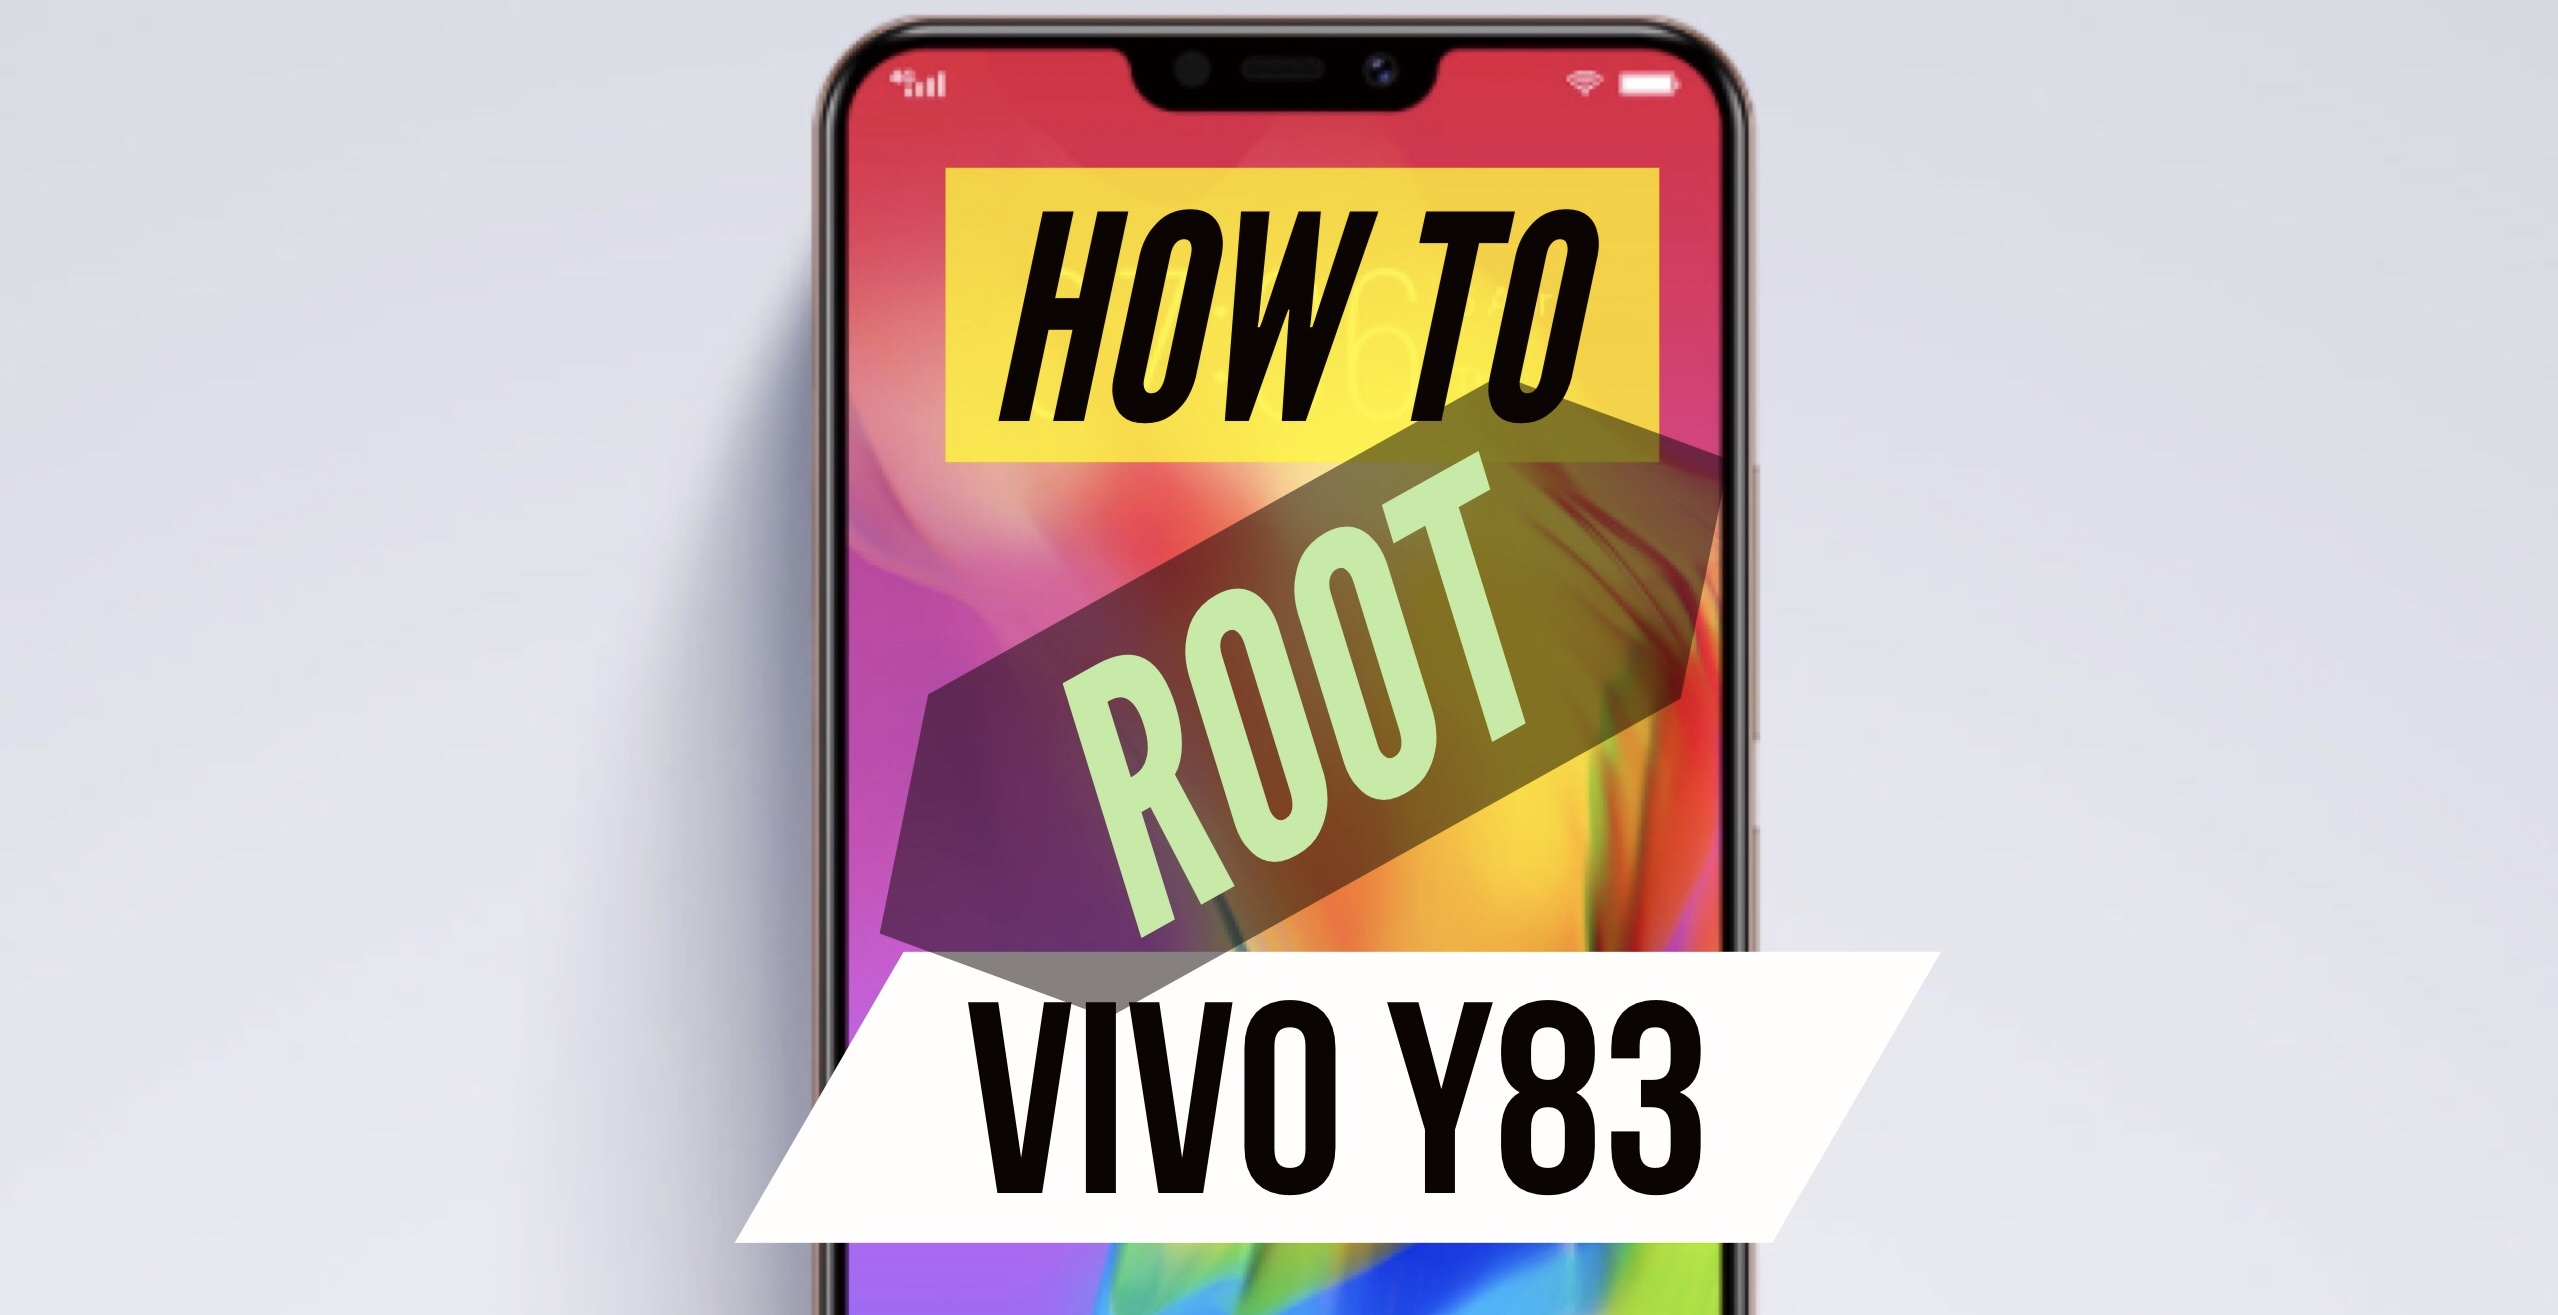 How to Root VIVO Y83 - Three Easy METHODS!